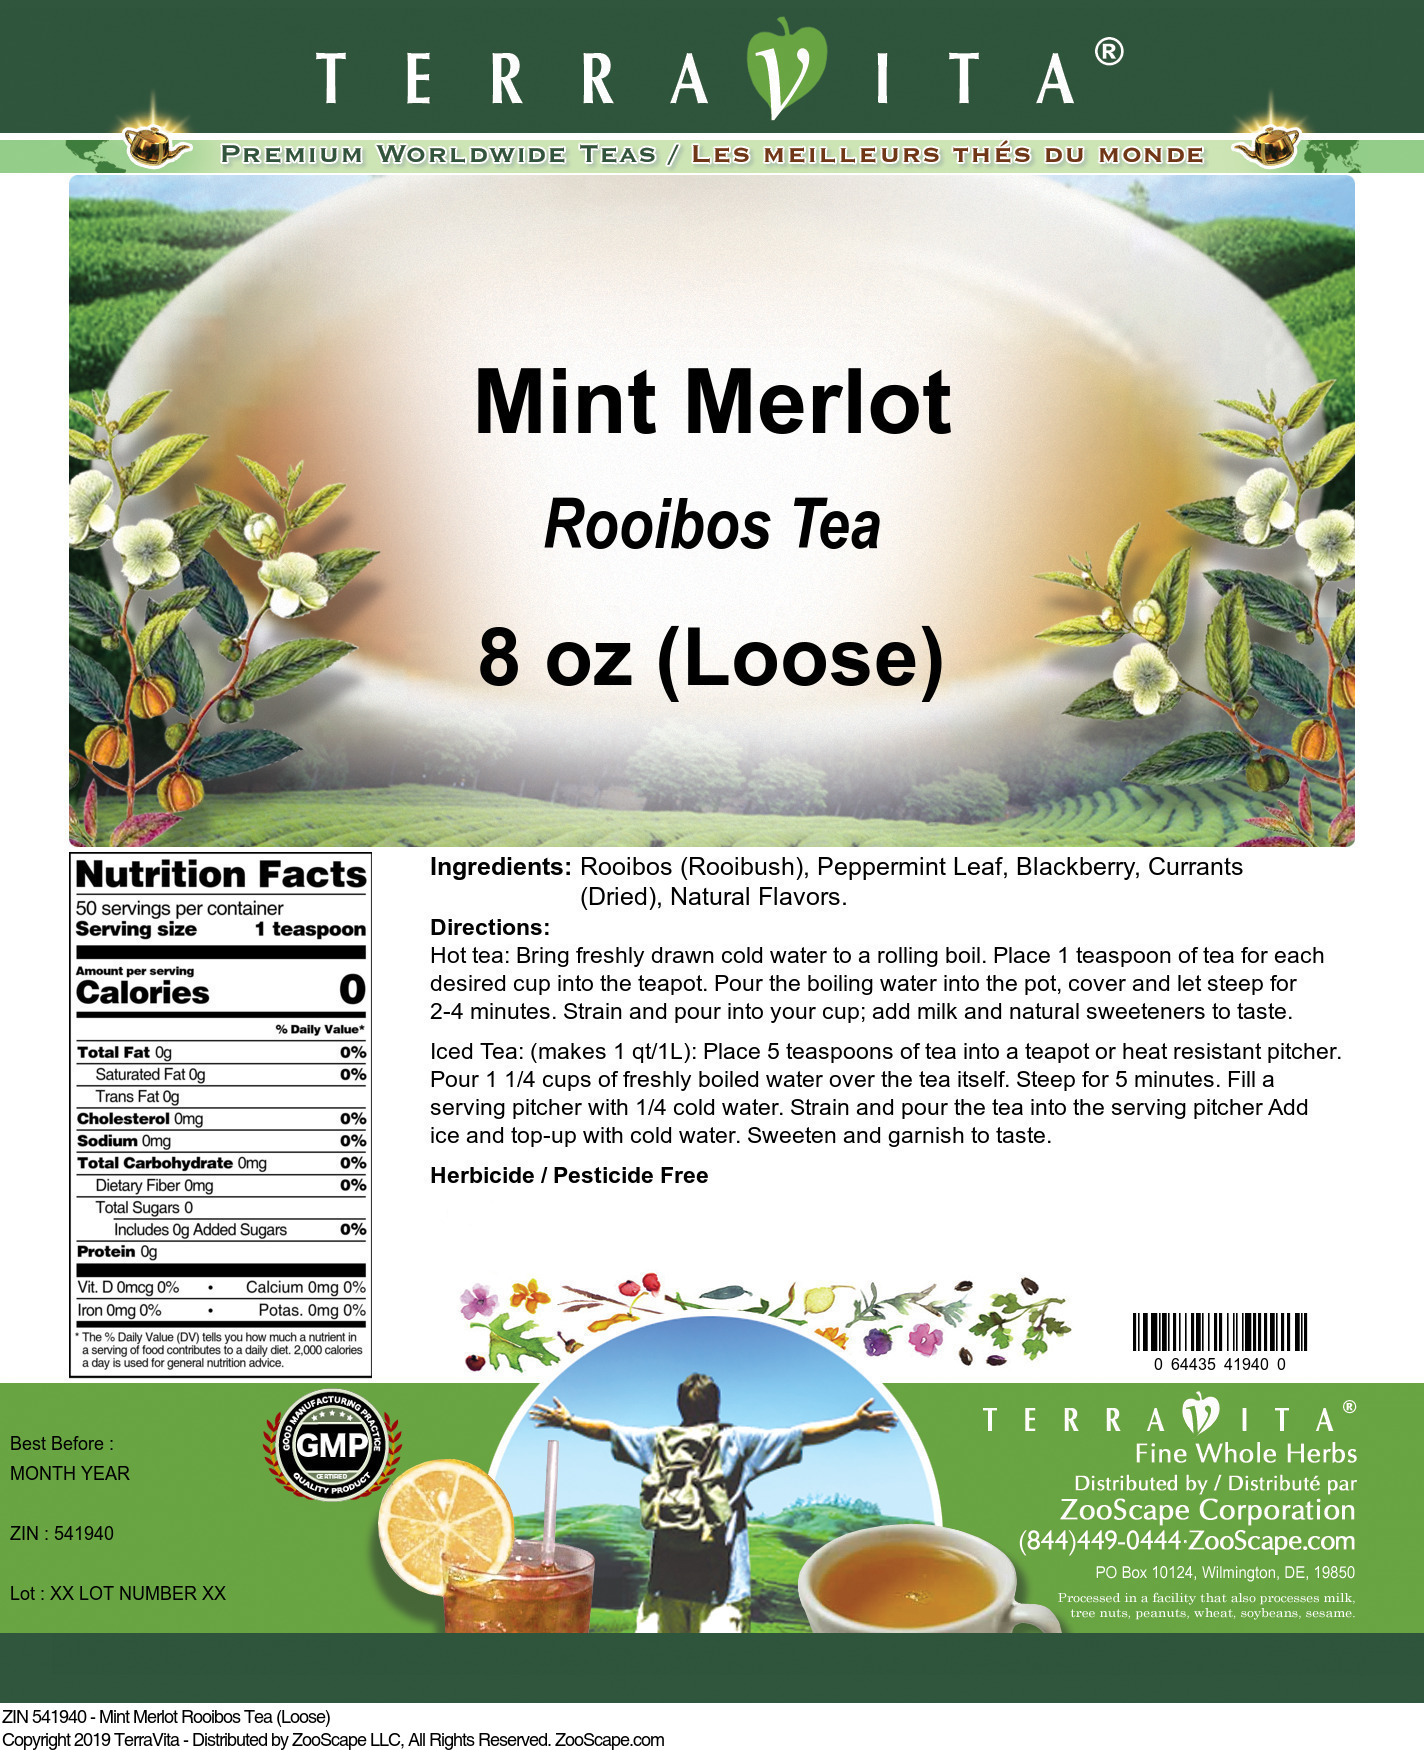 Mint Merlot Rooibos Tea